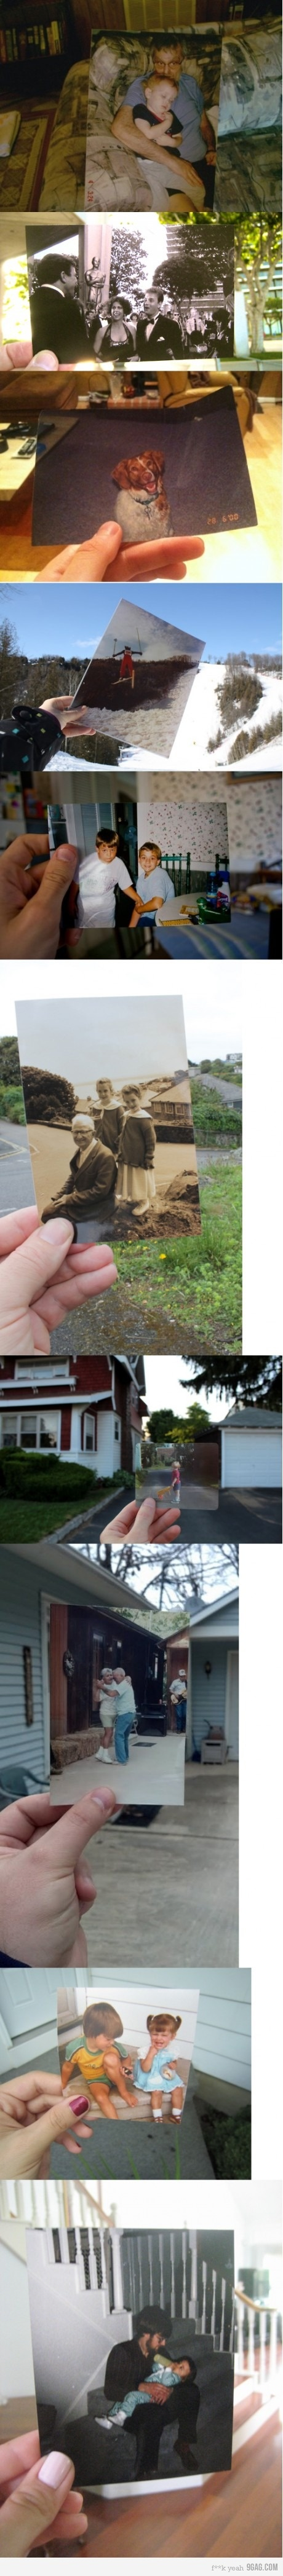 Dear Photograph, by Taylor Jones: Old Families Photos, Dear Photographers, Photographs, Cute Ideas, Cool Ideas, Old Pictures, Memories, Old Photos, Taylors Jones